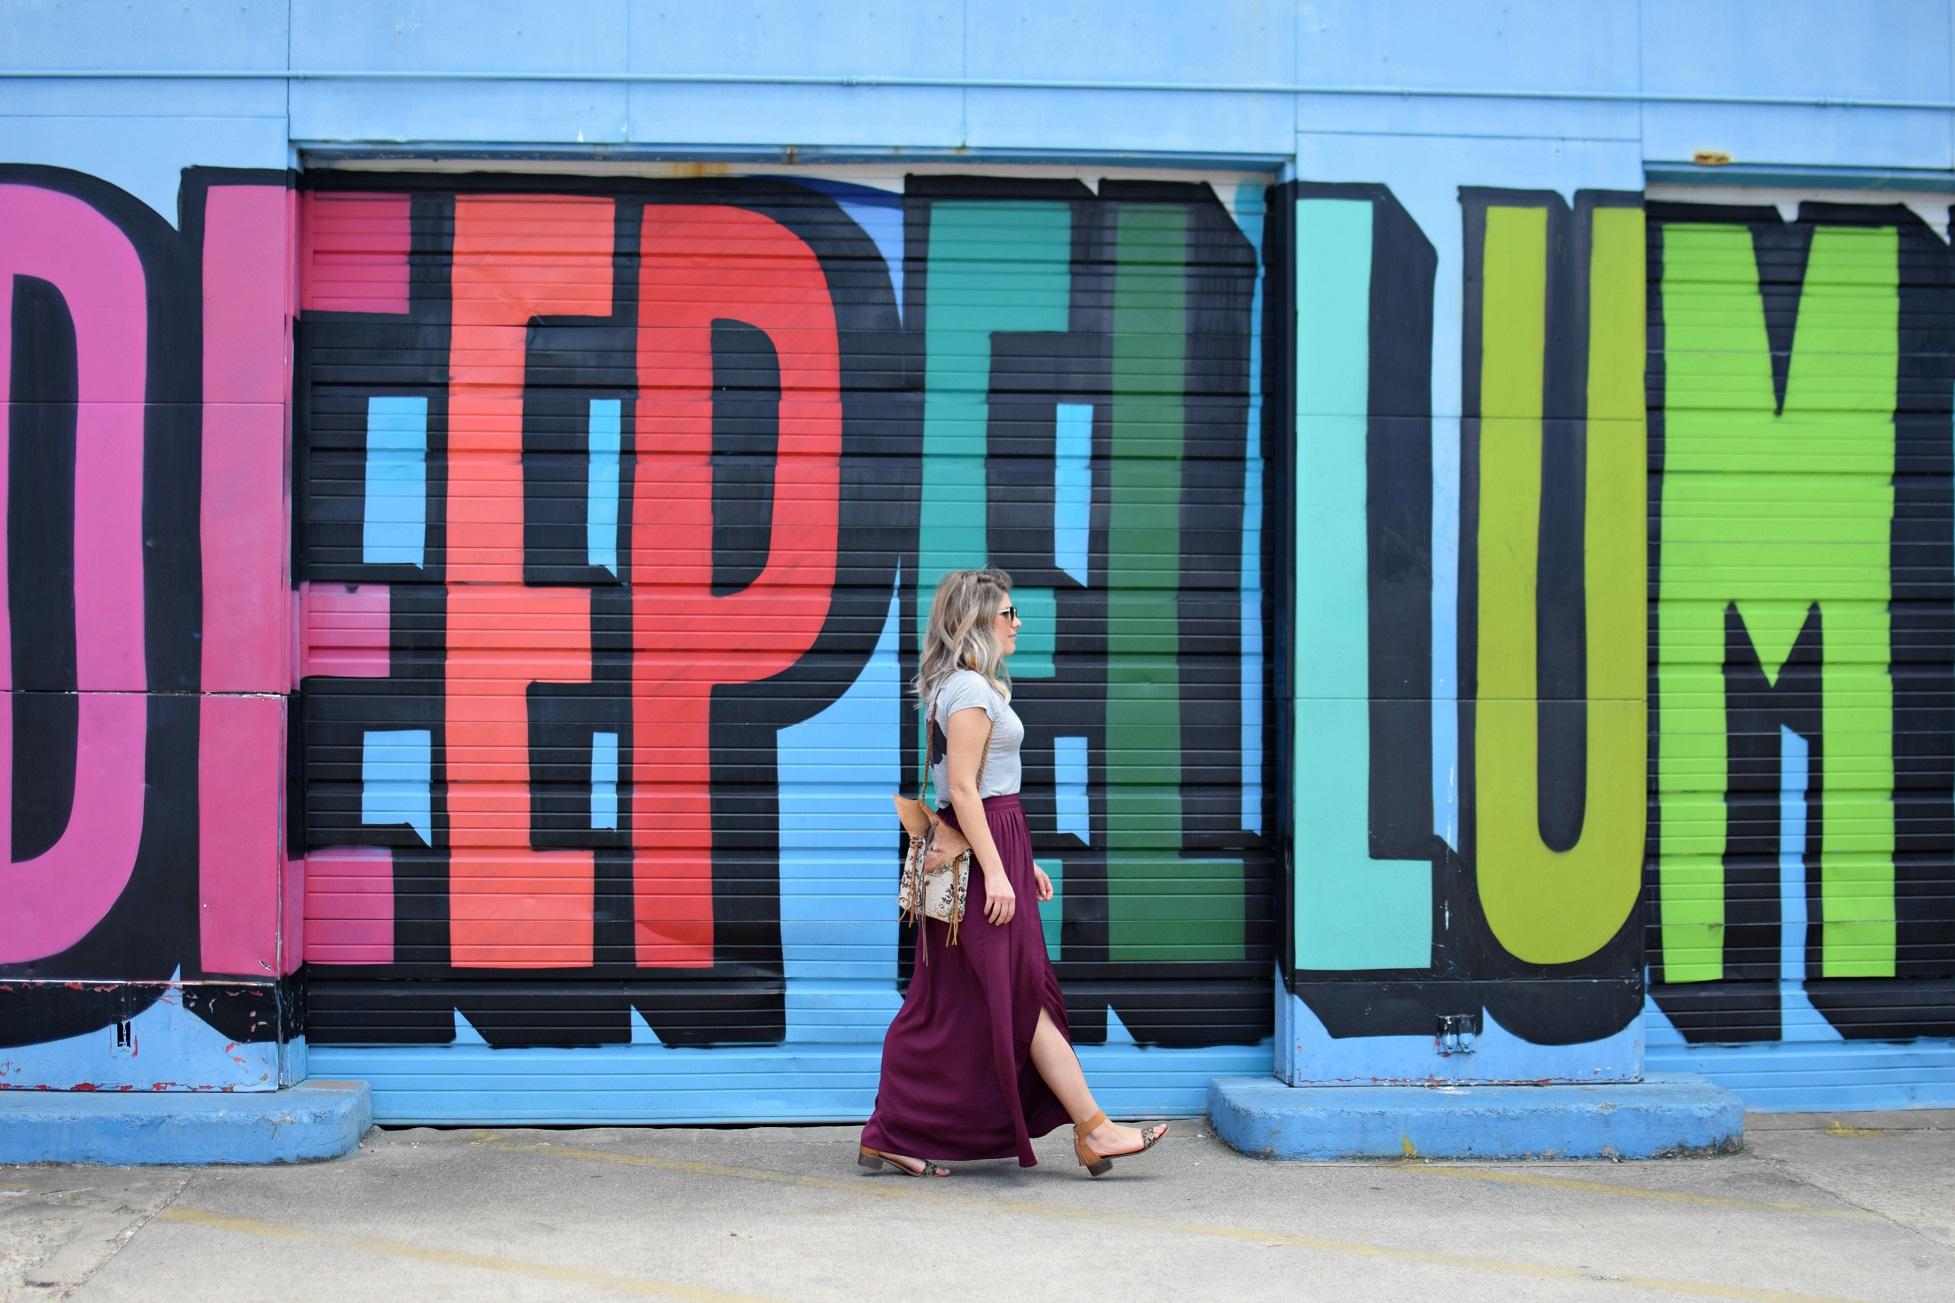 ootd by deep ellum mural dallas texas